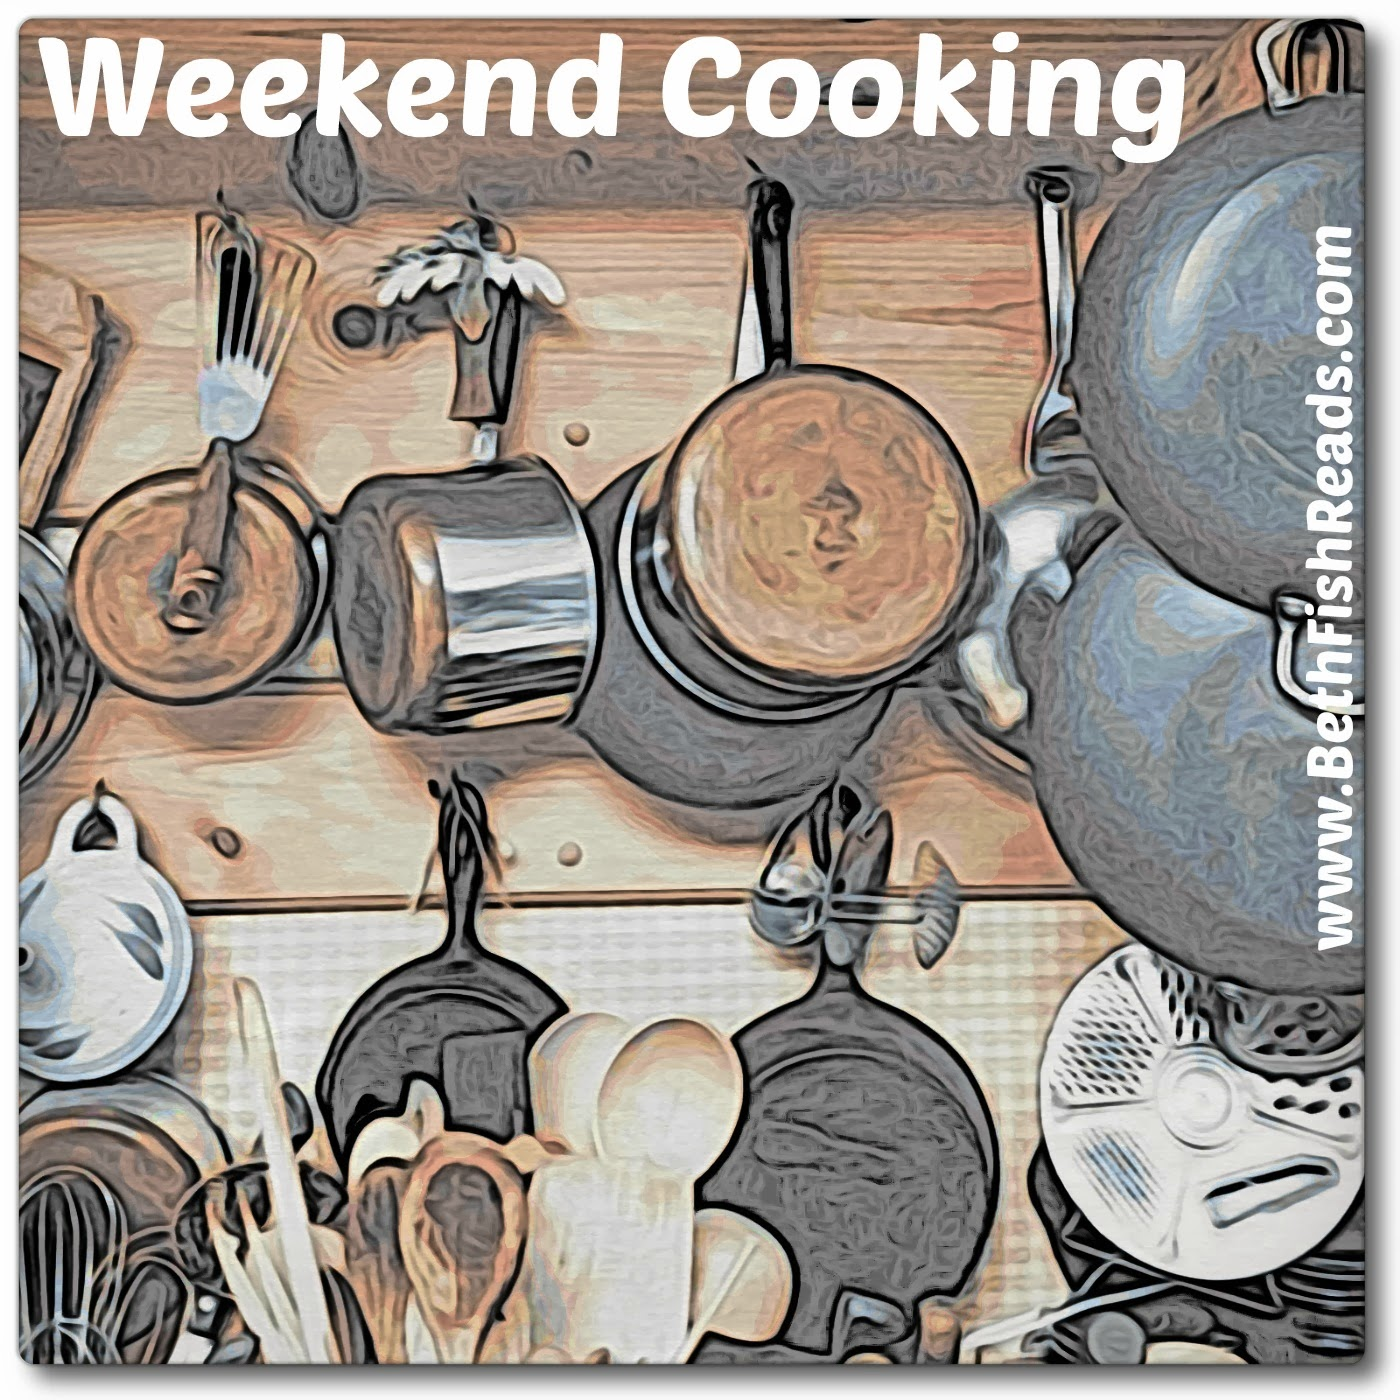 weekend cooking feature badge bethfishreads